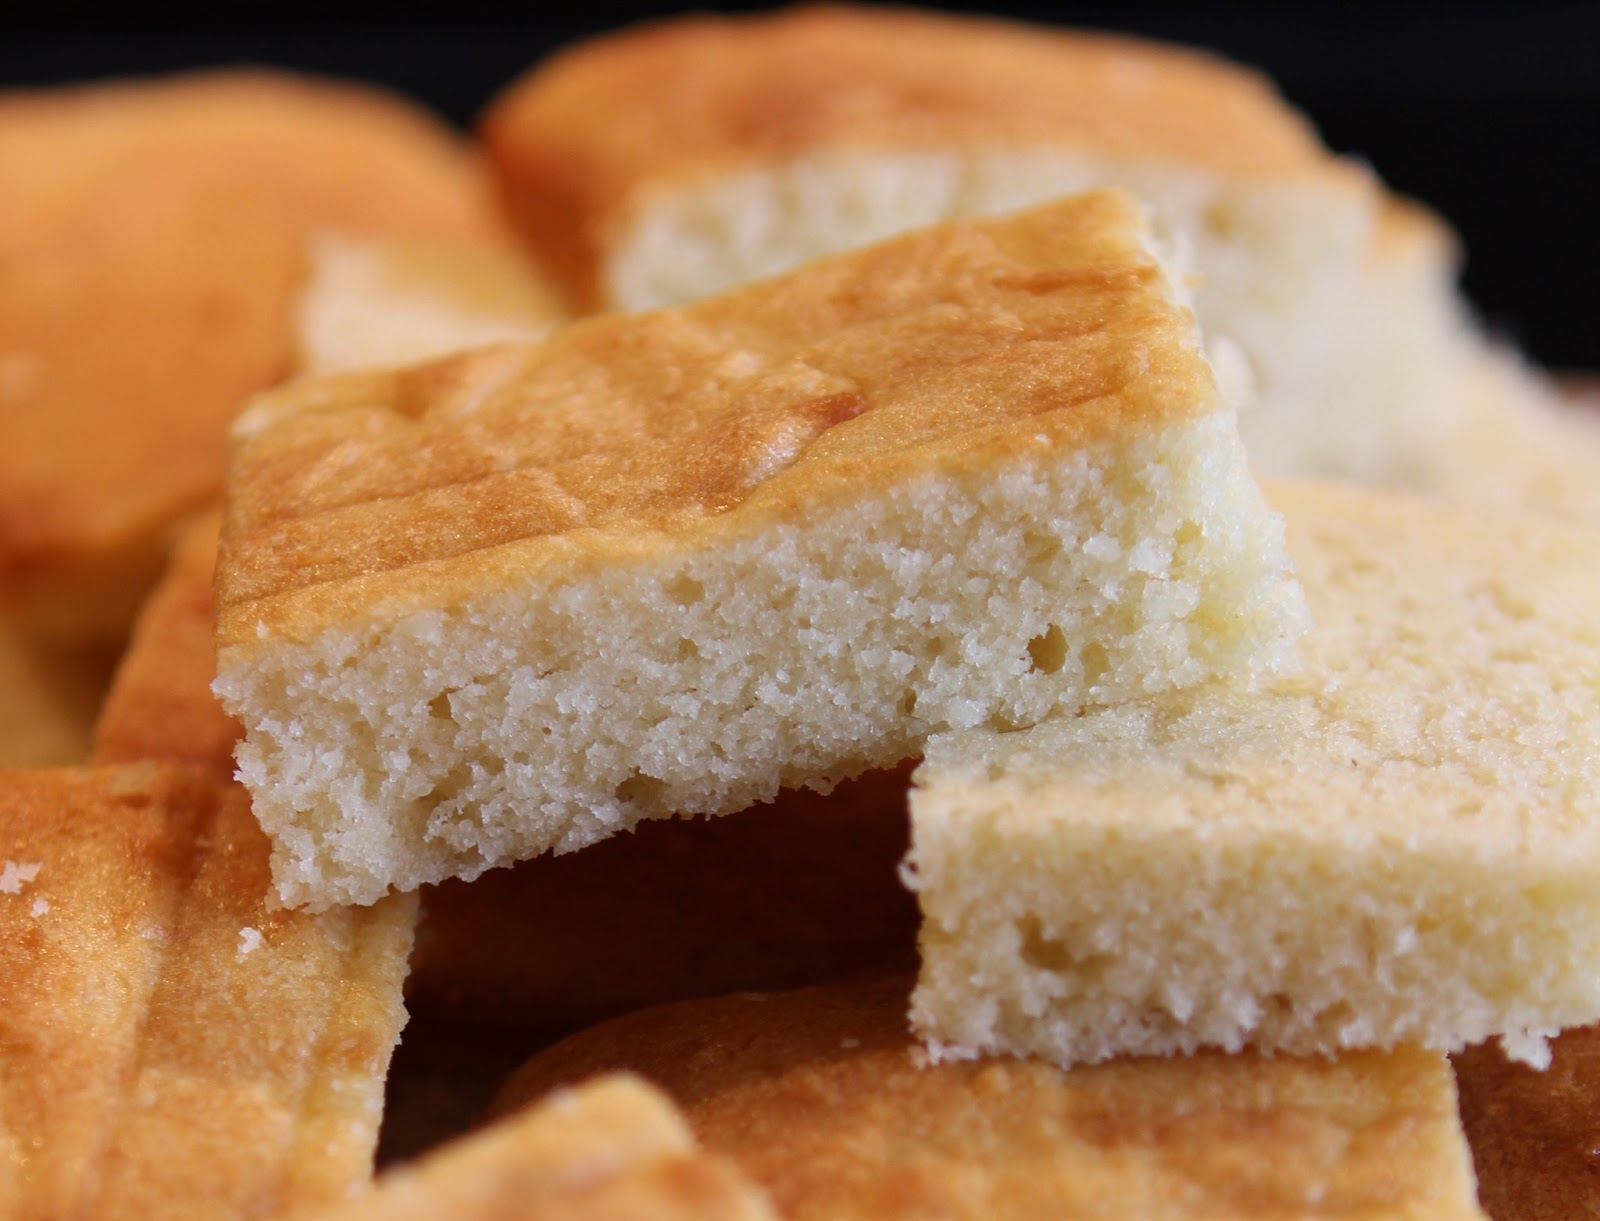 Gluten Free Sponge Cake With Ground Almonds